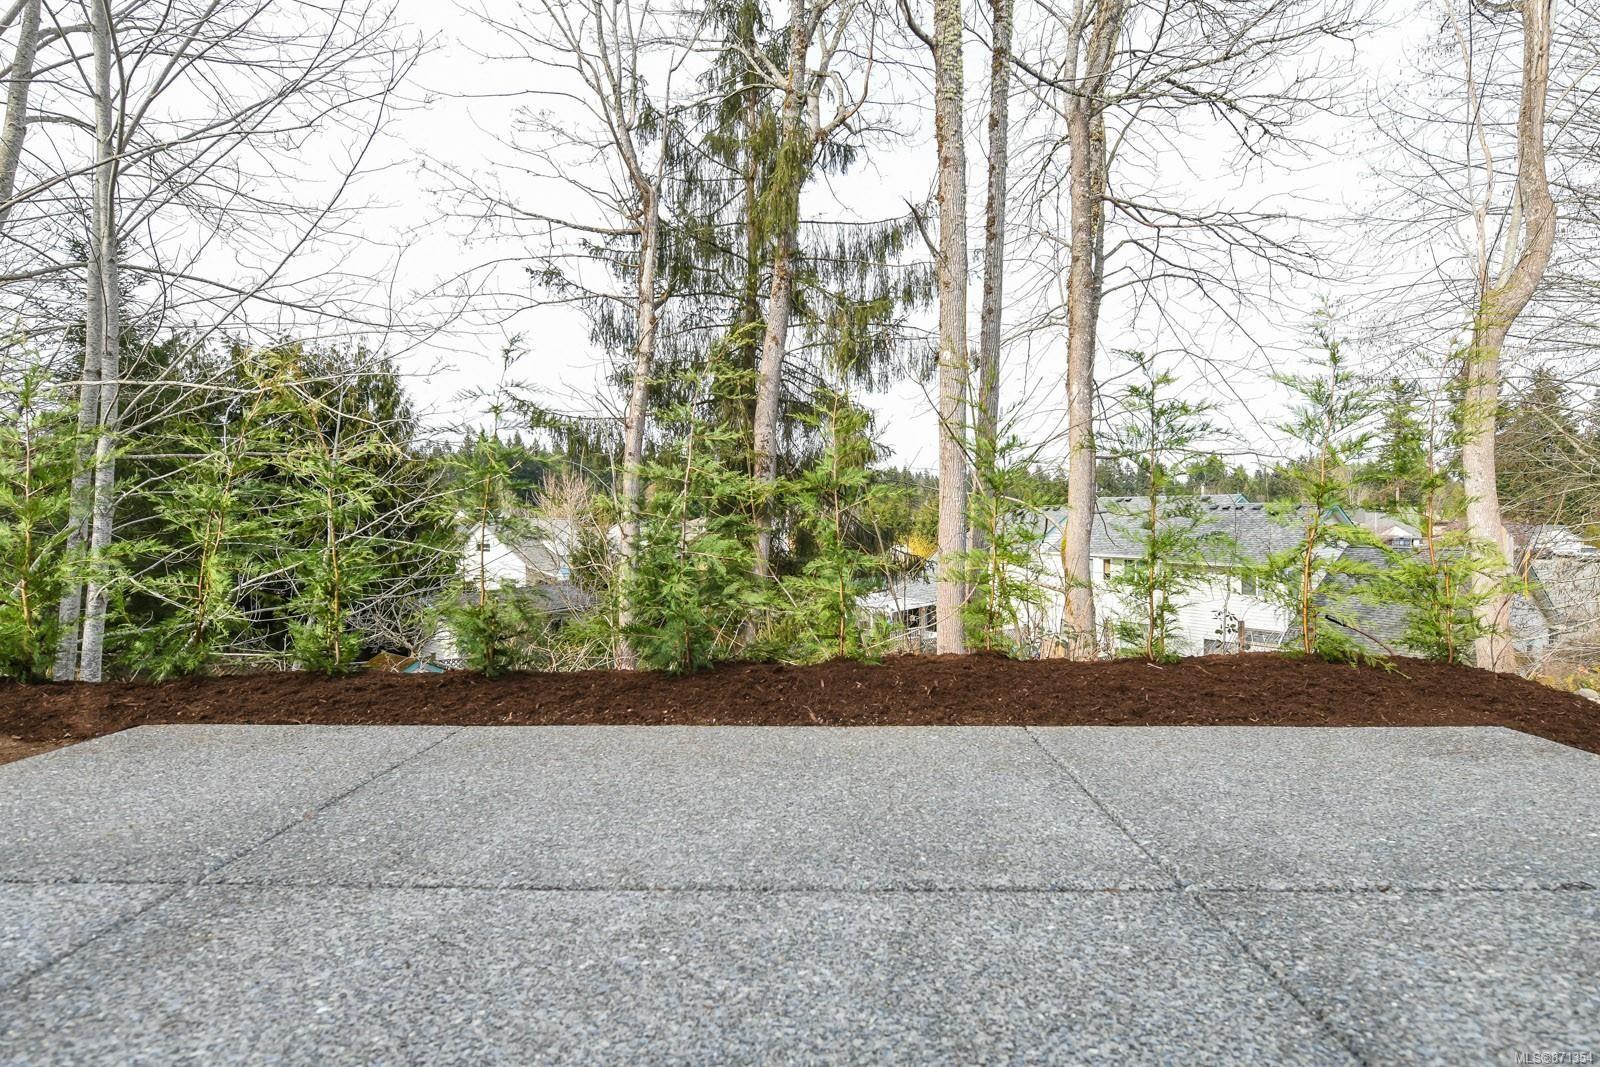 Photo 30: Photos: 68 Grayhawk Pl in : CV Courtenay City House for sale (Comox Valley)  : MLS®# 871354